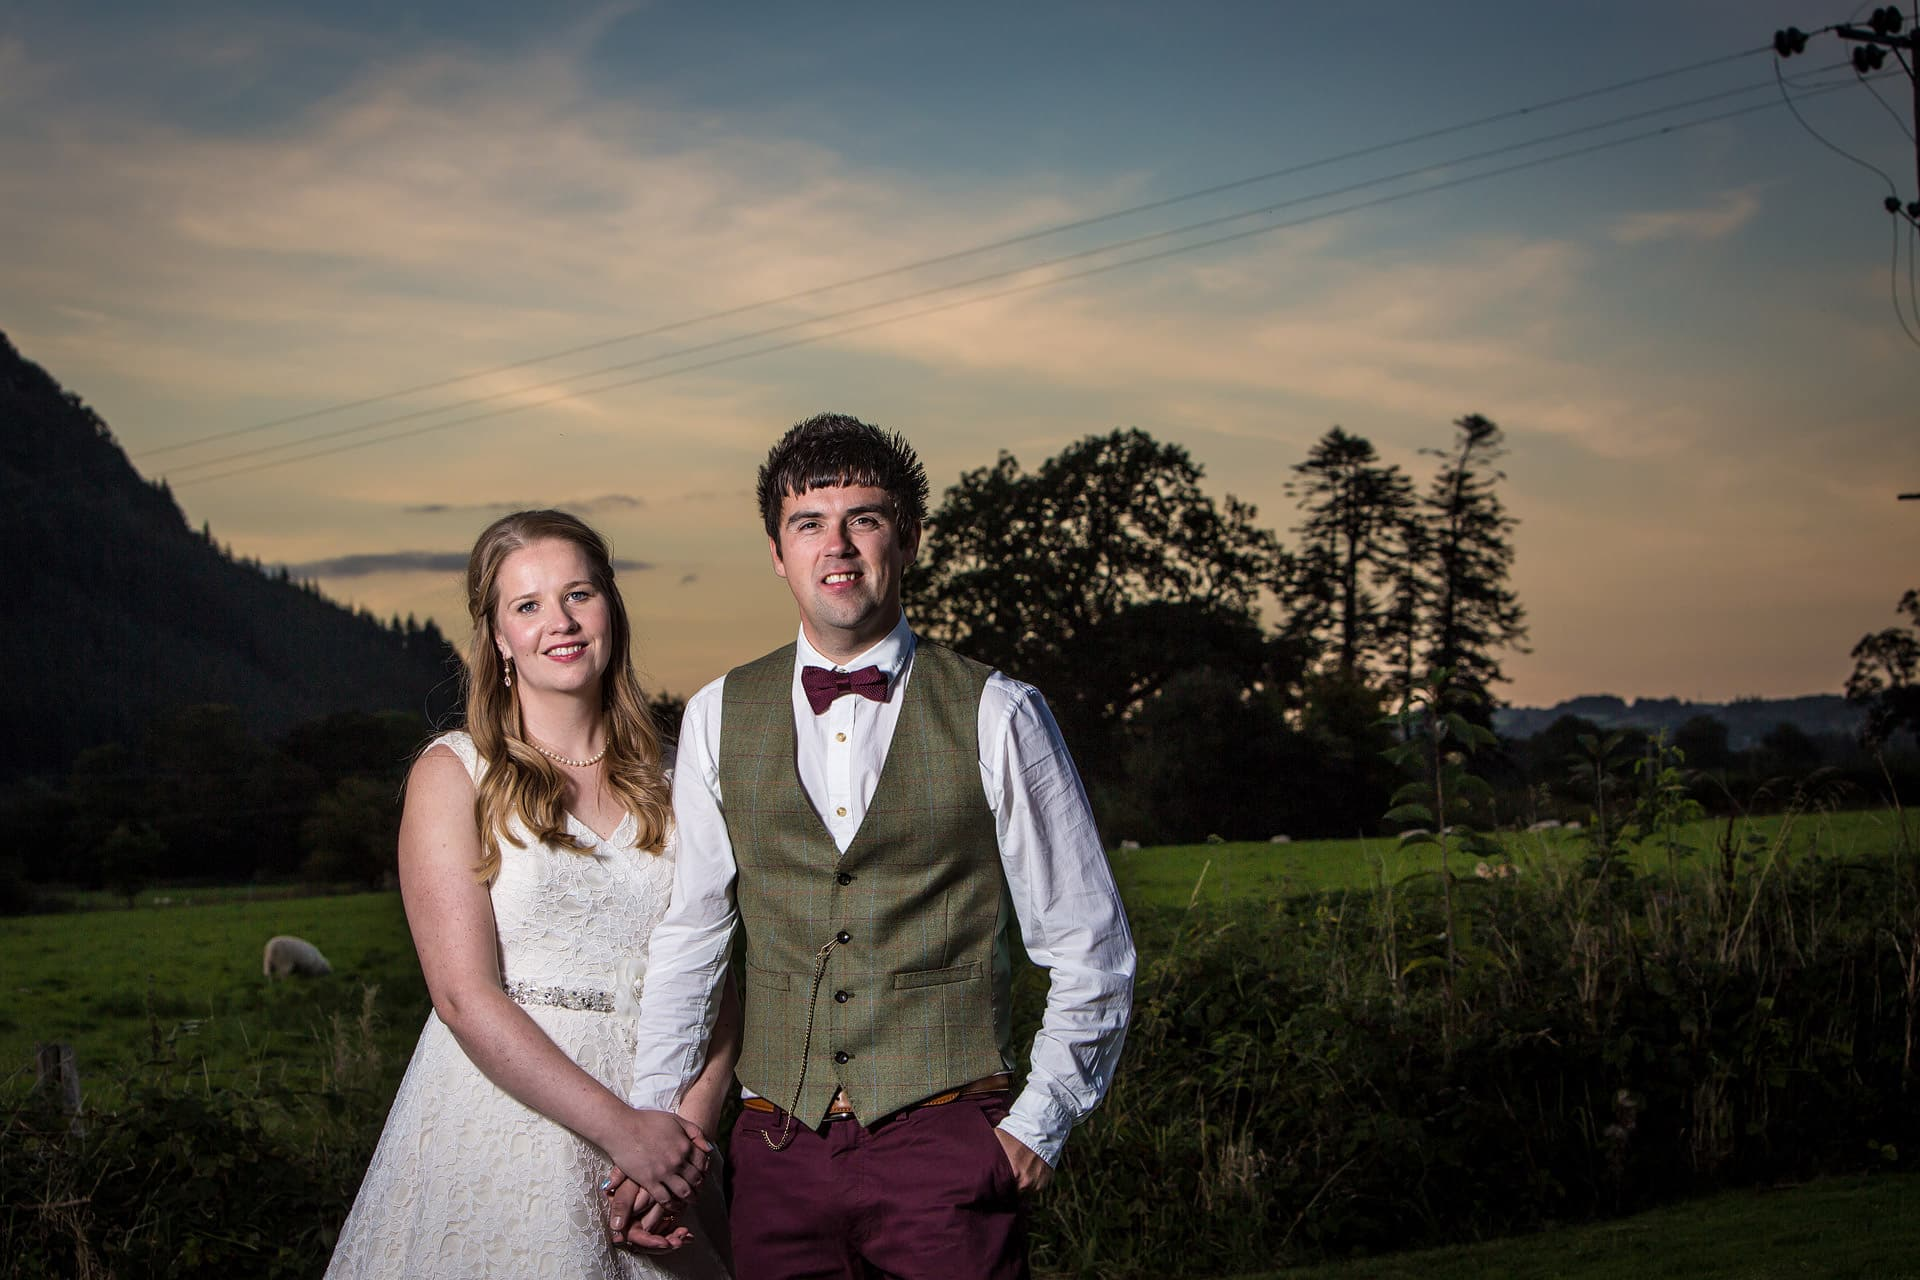 wedding photography sunset at hafod farm